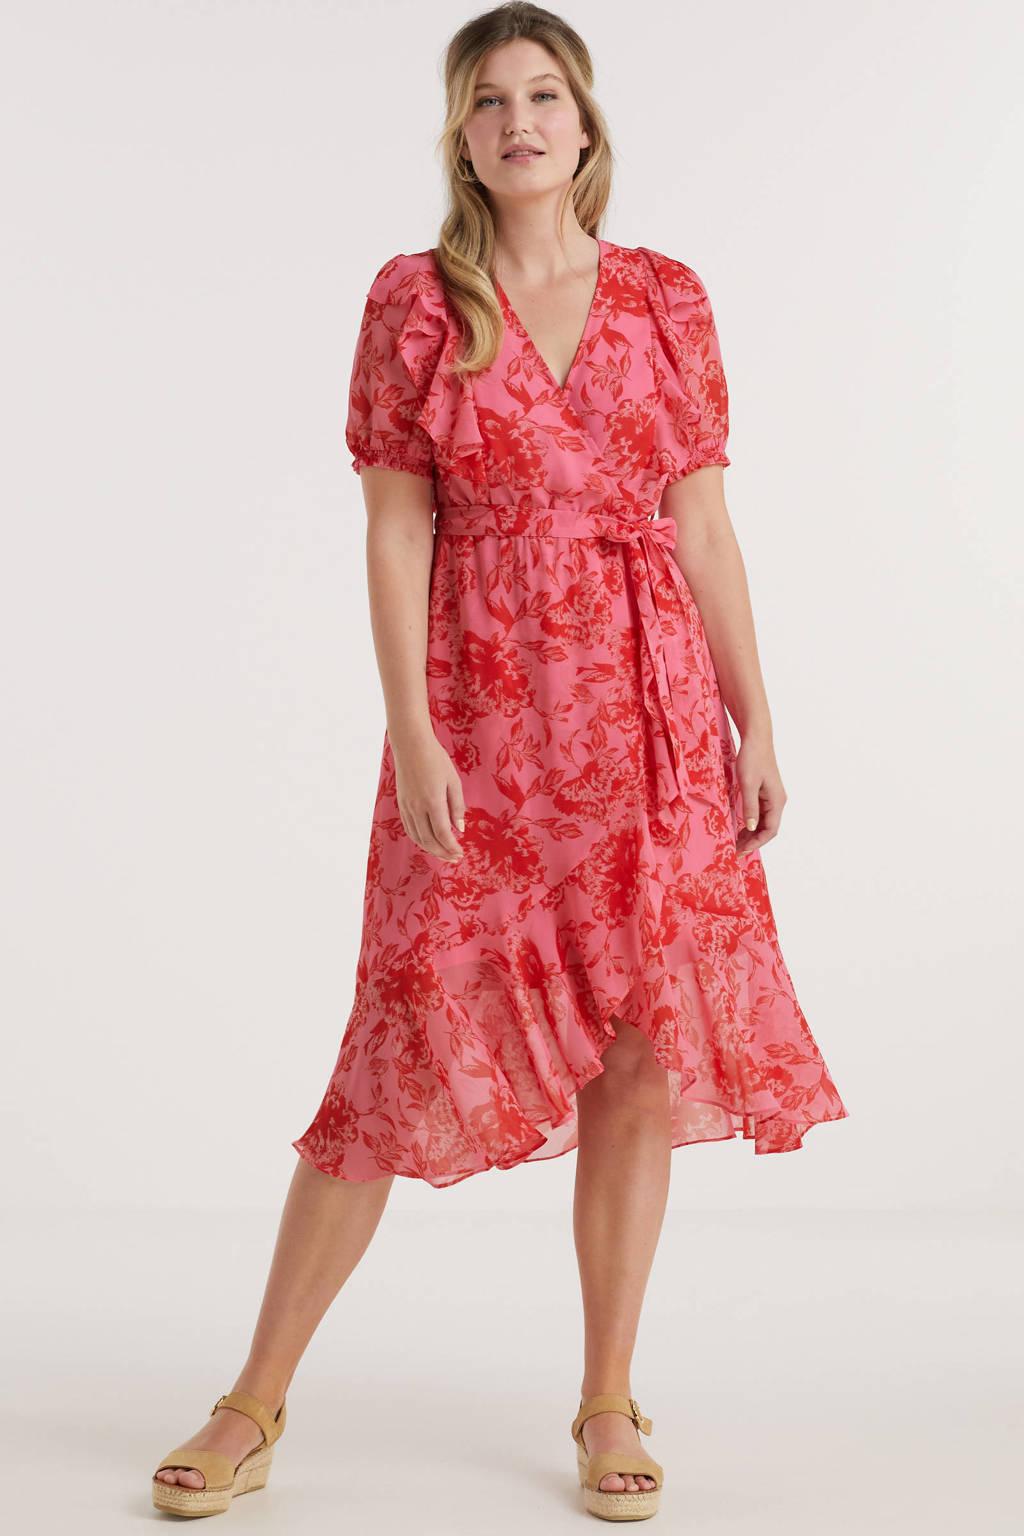 Miljuschka by Wehkamp wikkel-look jurk met ruches en bloemenprint rood, Rood/roze